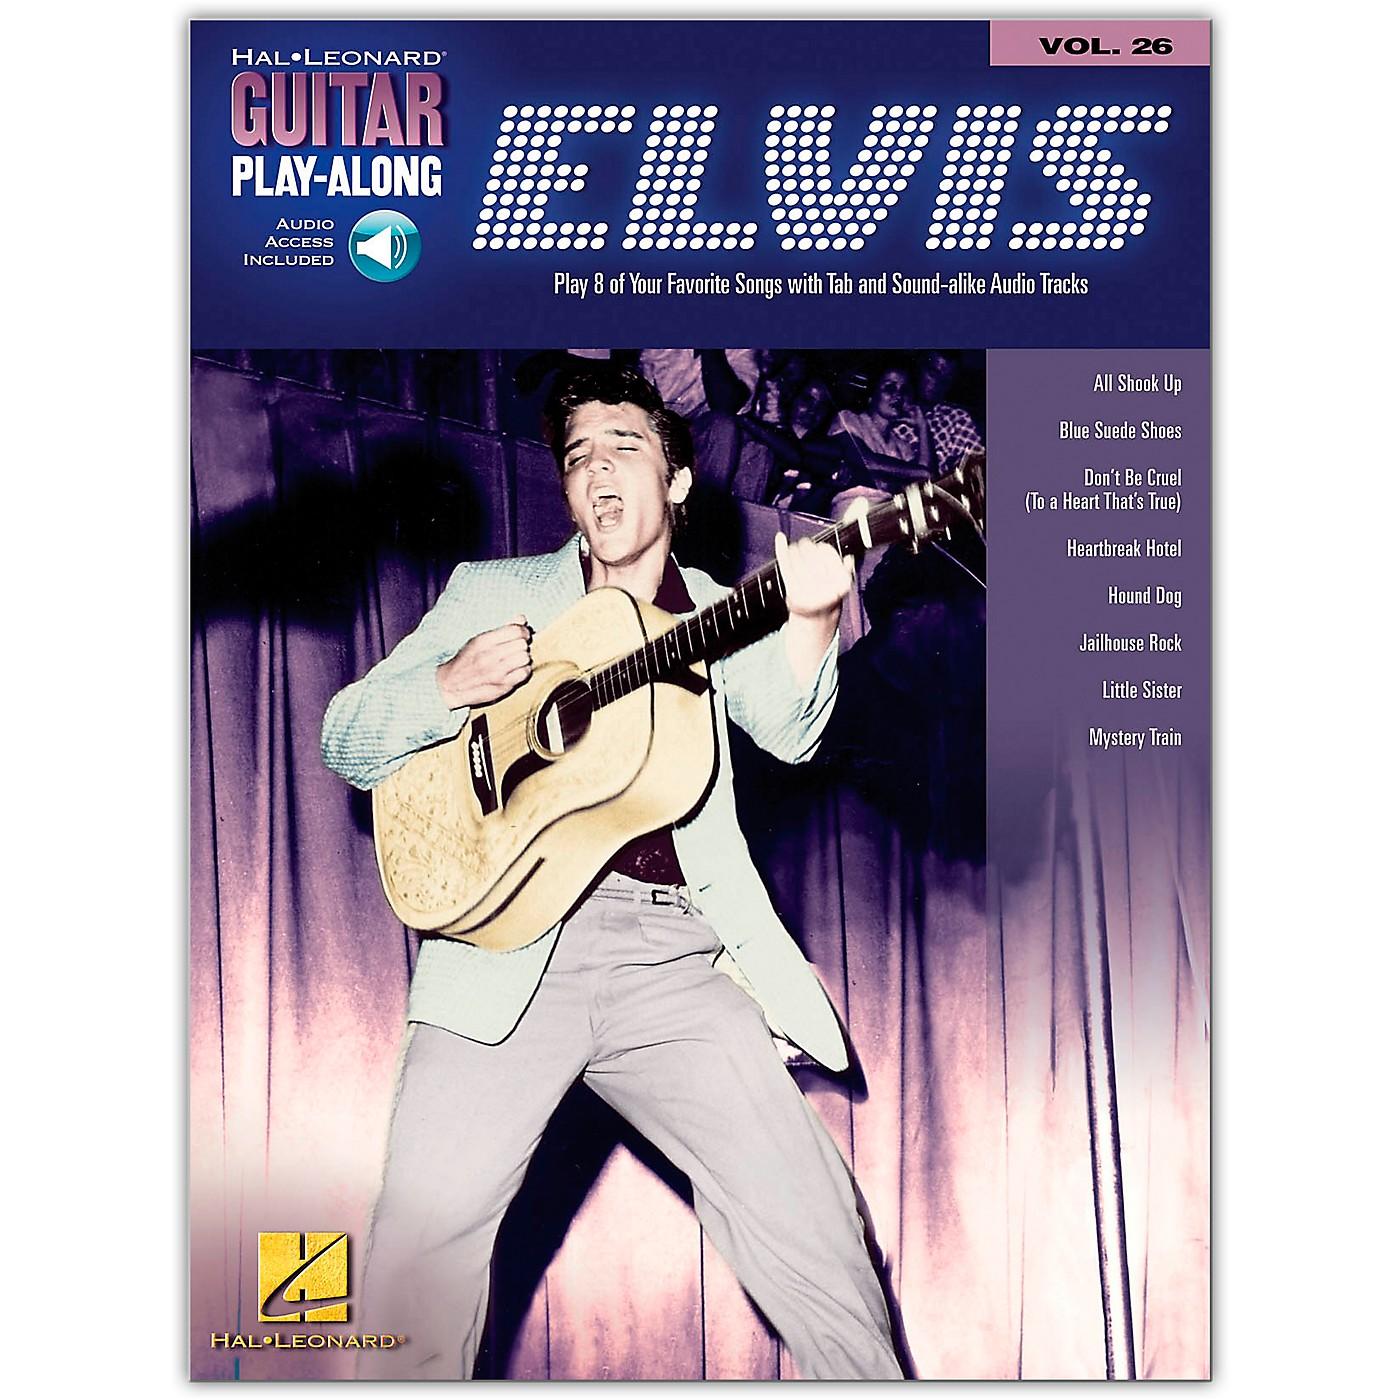 Hal Leonard Elvis Presley Guitar Play-Along Series Volume 26 (Book/Online Audio) thumbnail